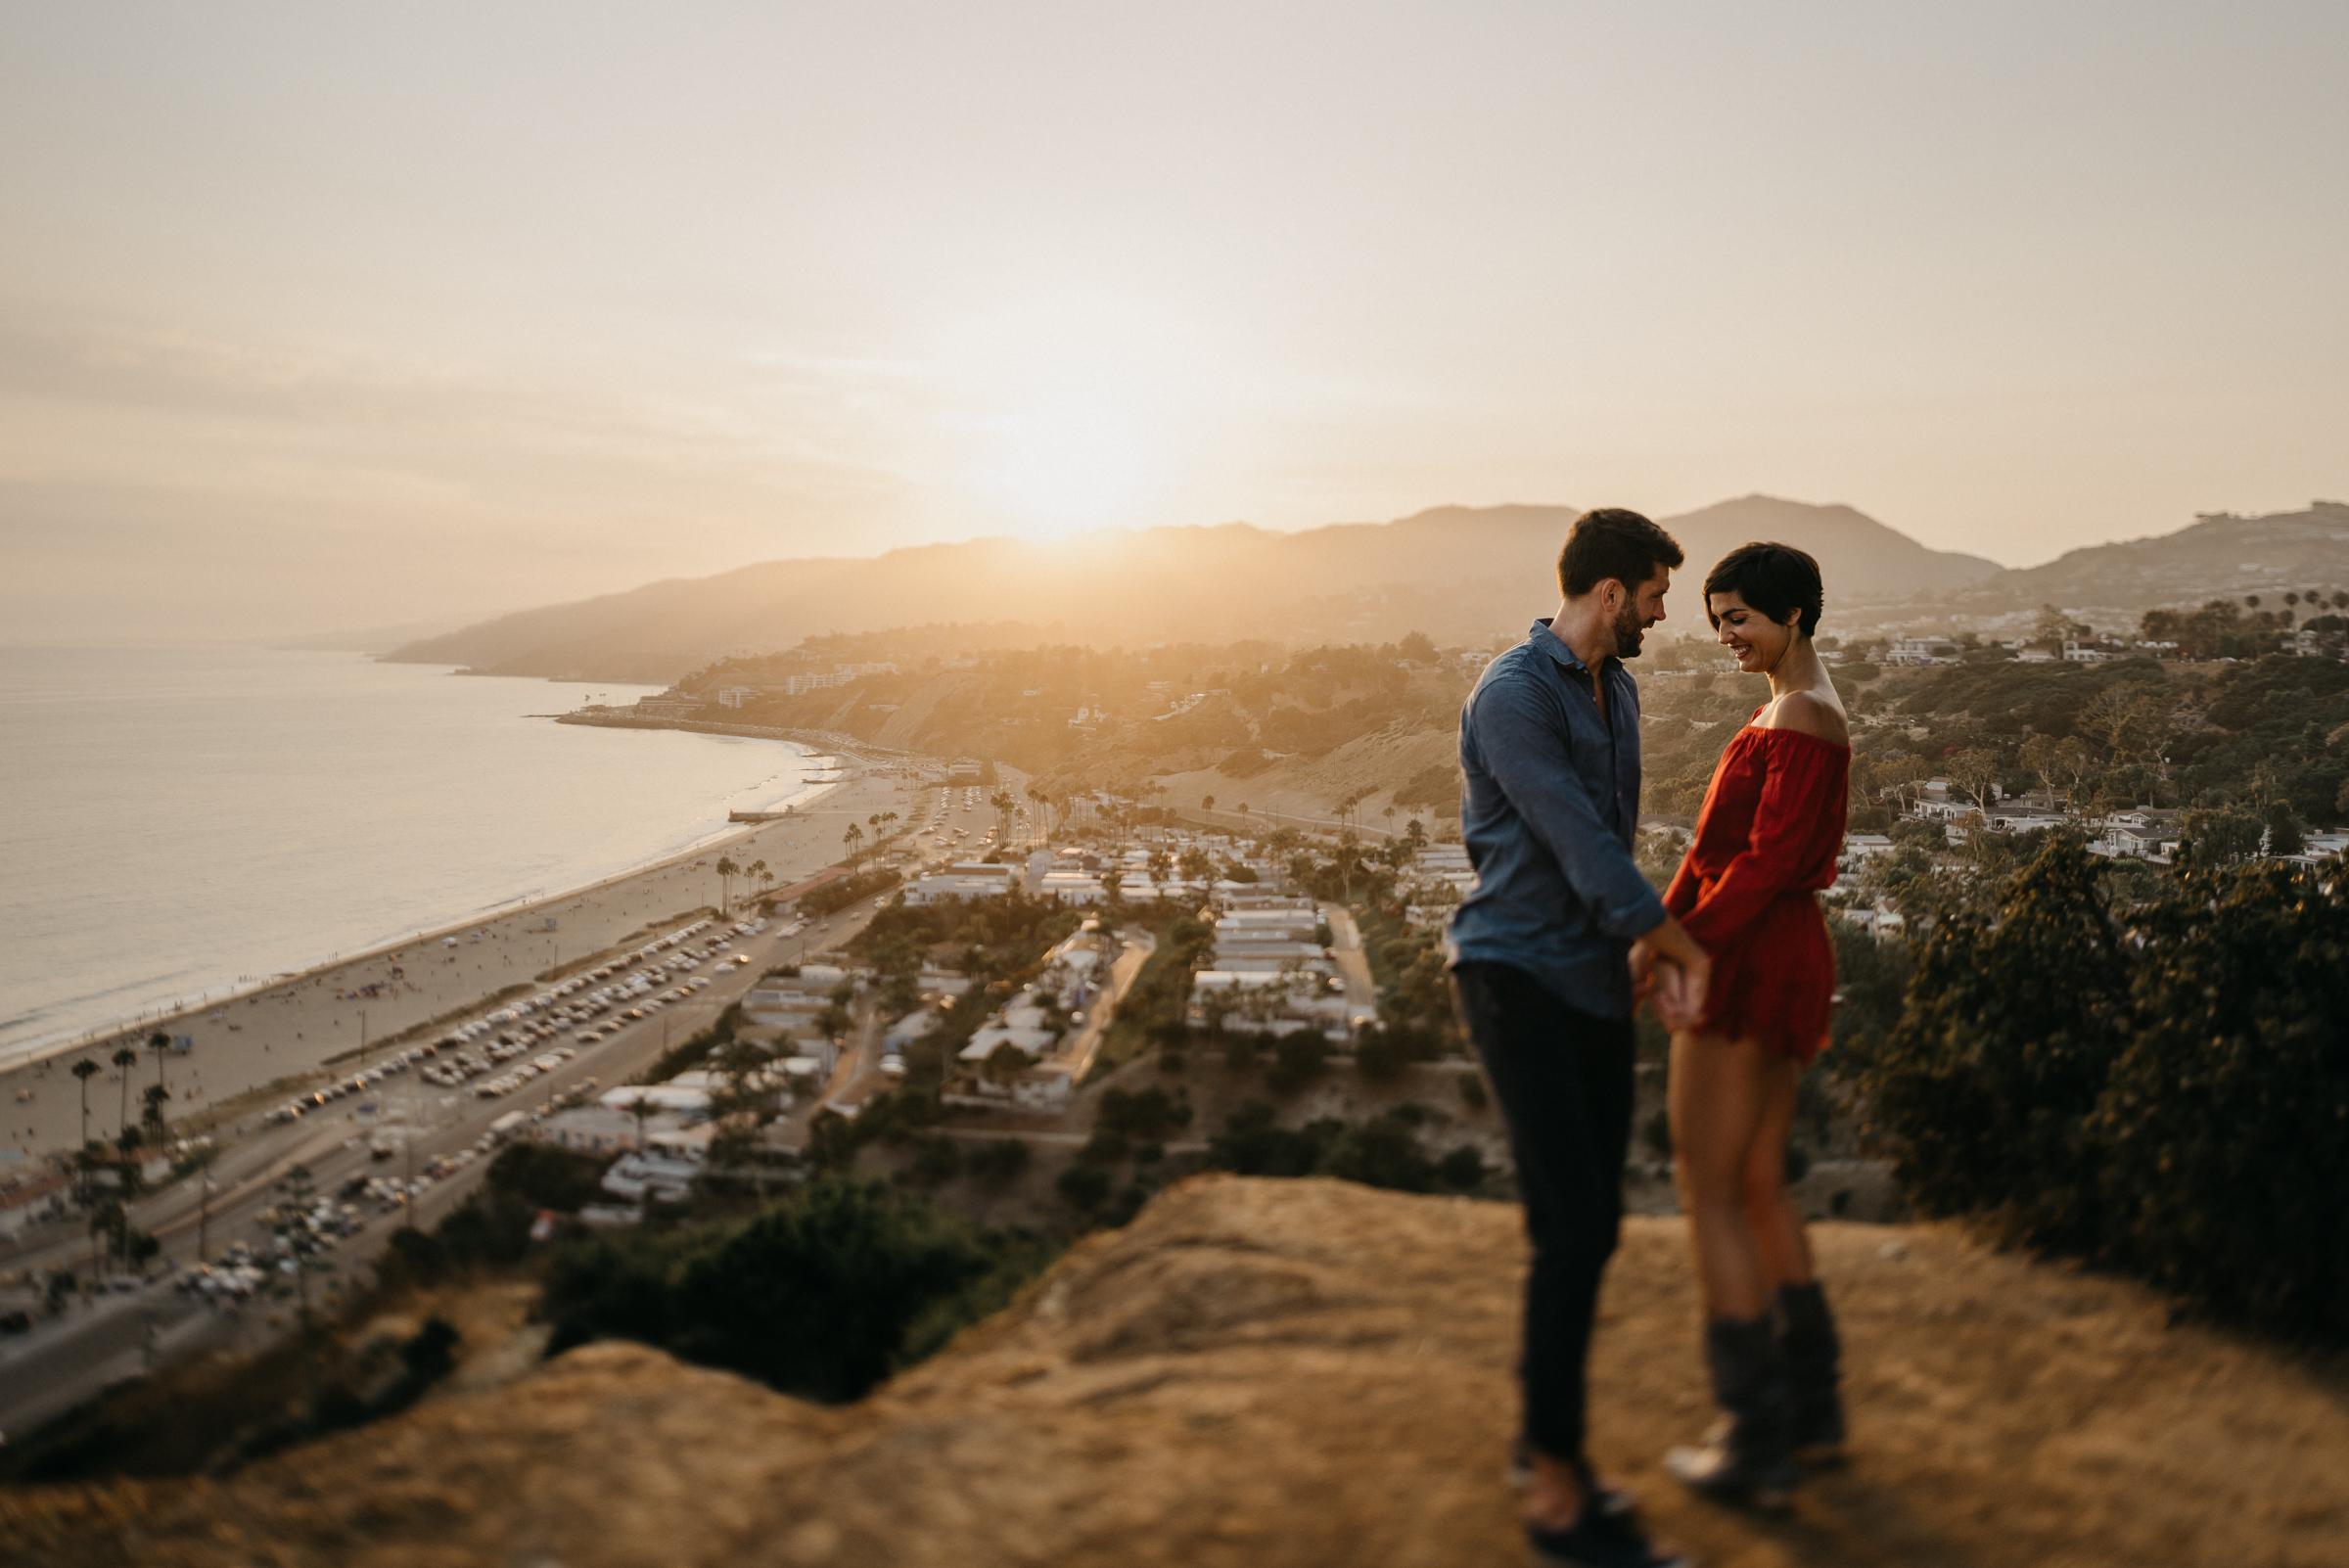 Isaiah + Taylor Photography - Santa Monica Engagement Session, Los Angeles Wedding Photographer-034.jpg